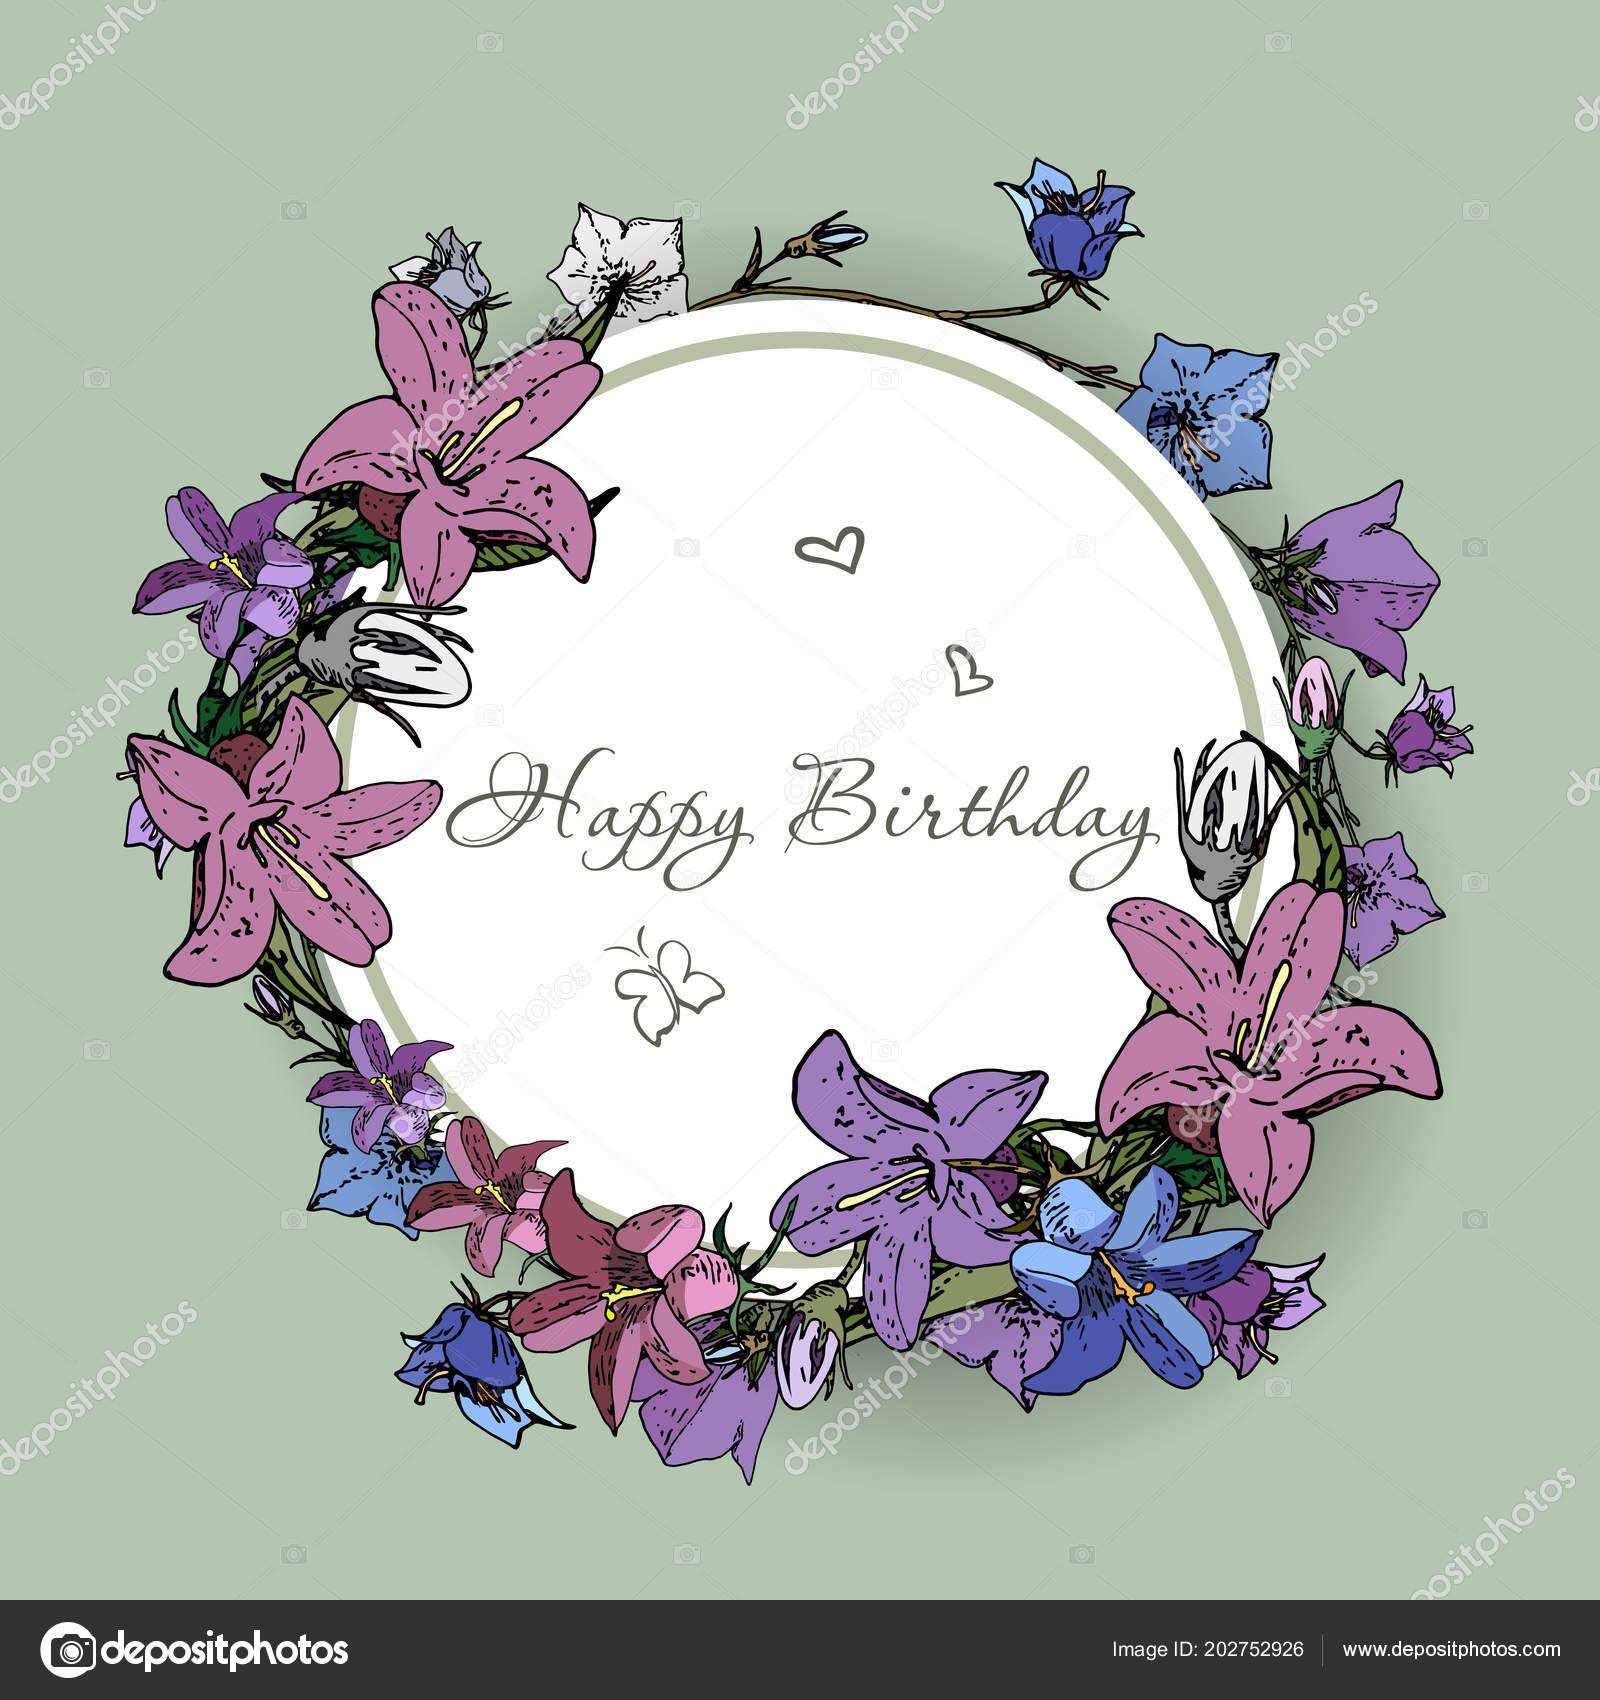 Vector happy birthday card with flowers stock vector familyf vector happy birthday card with flowers stock vector izmirmasajfo